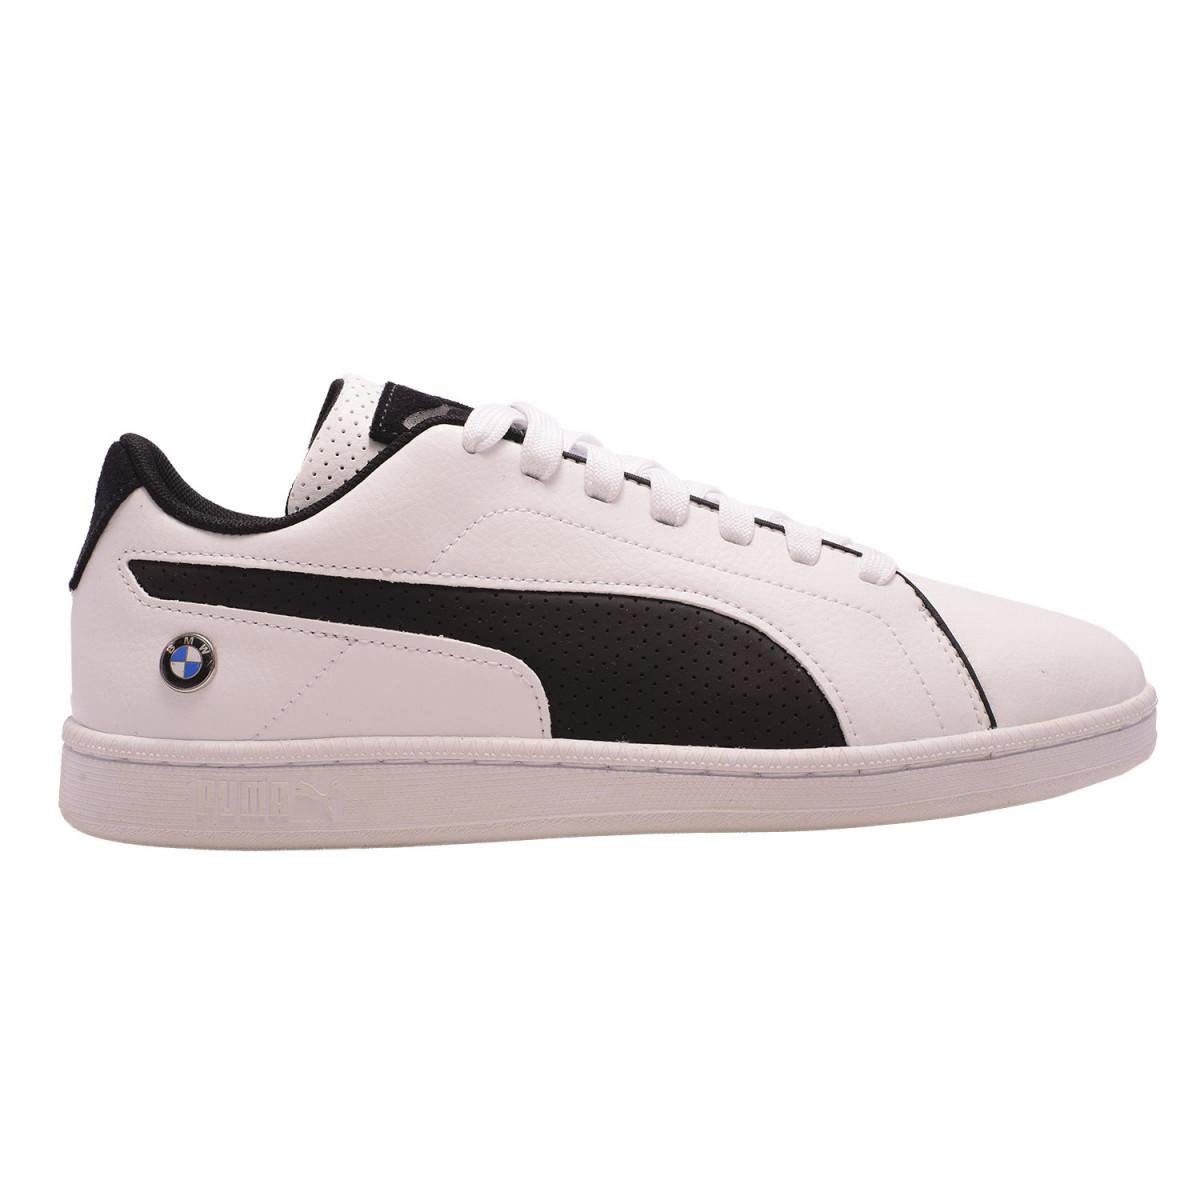 Zapatillas Puma BMW